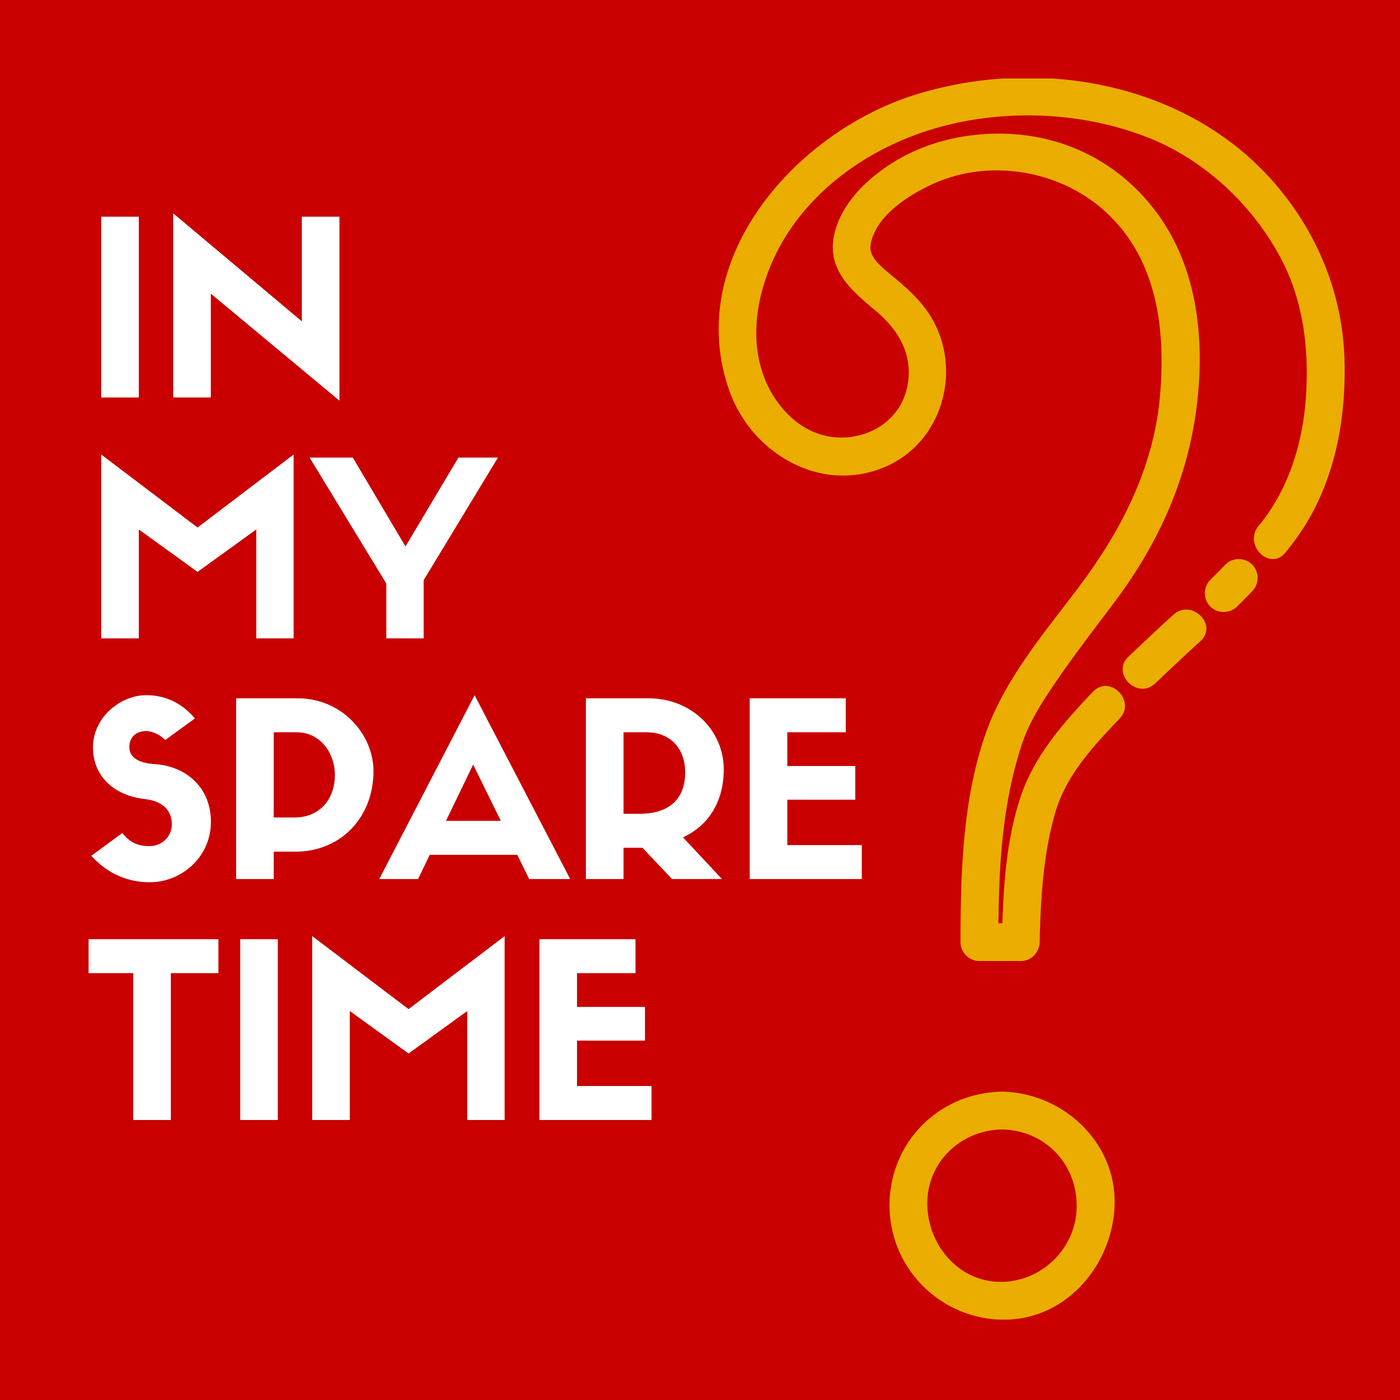 Episode 2 - Starseeds/Allen — IN MY SPARE TIME